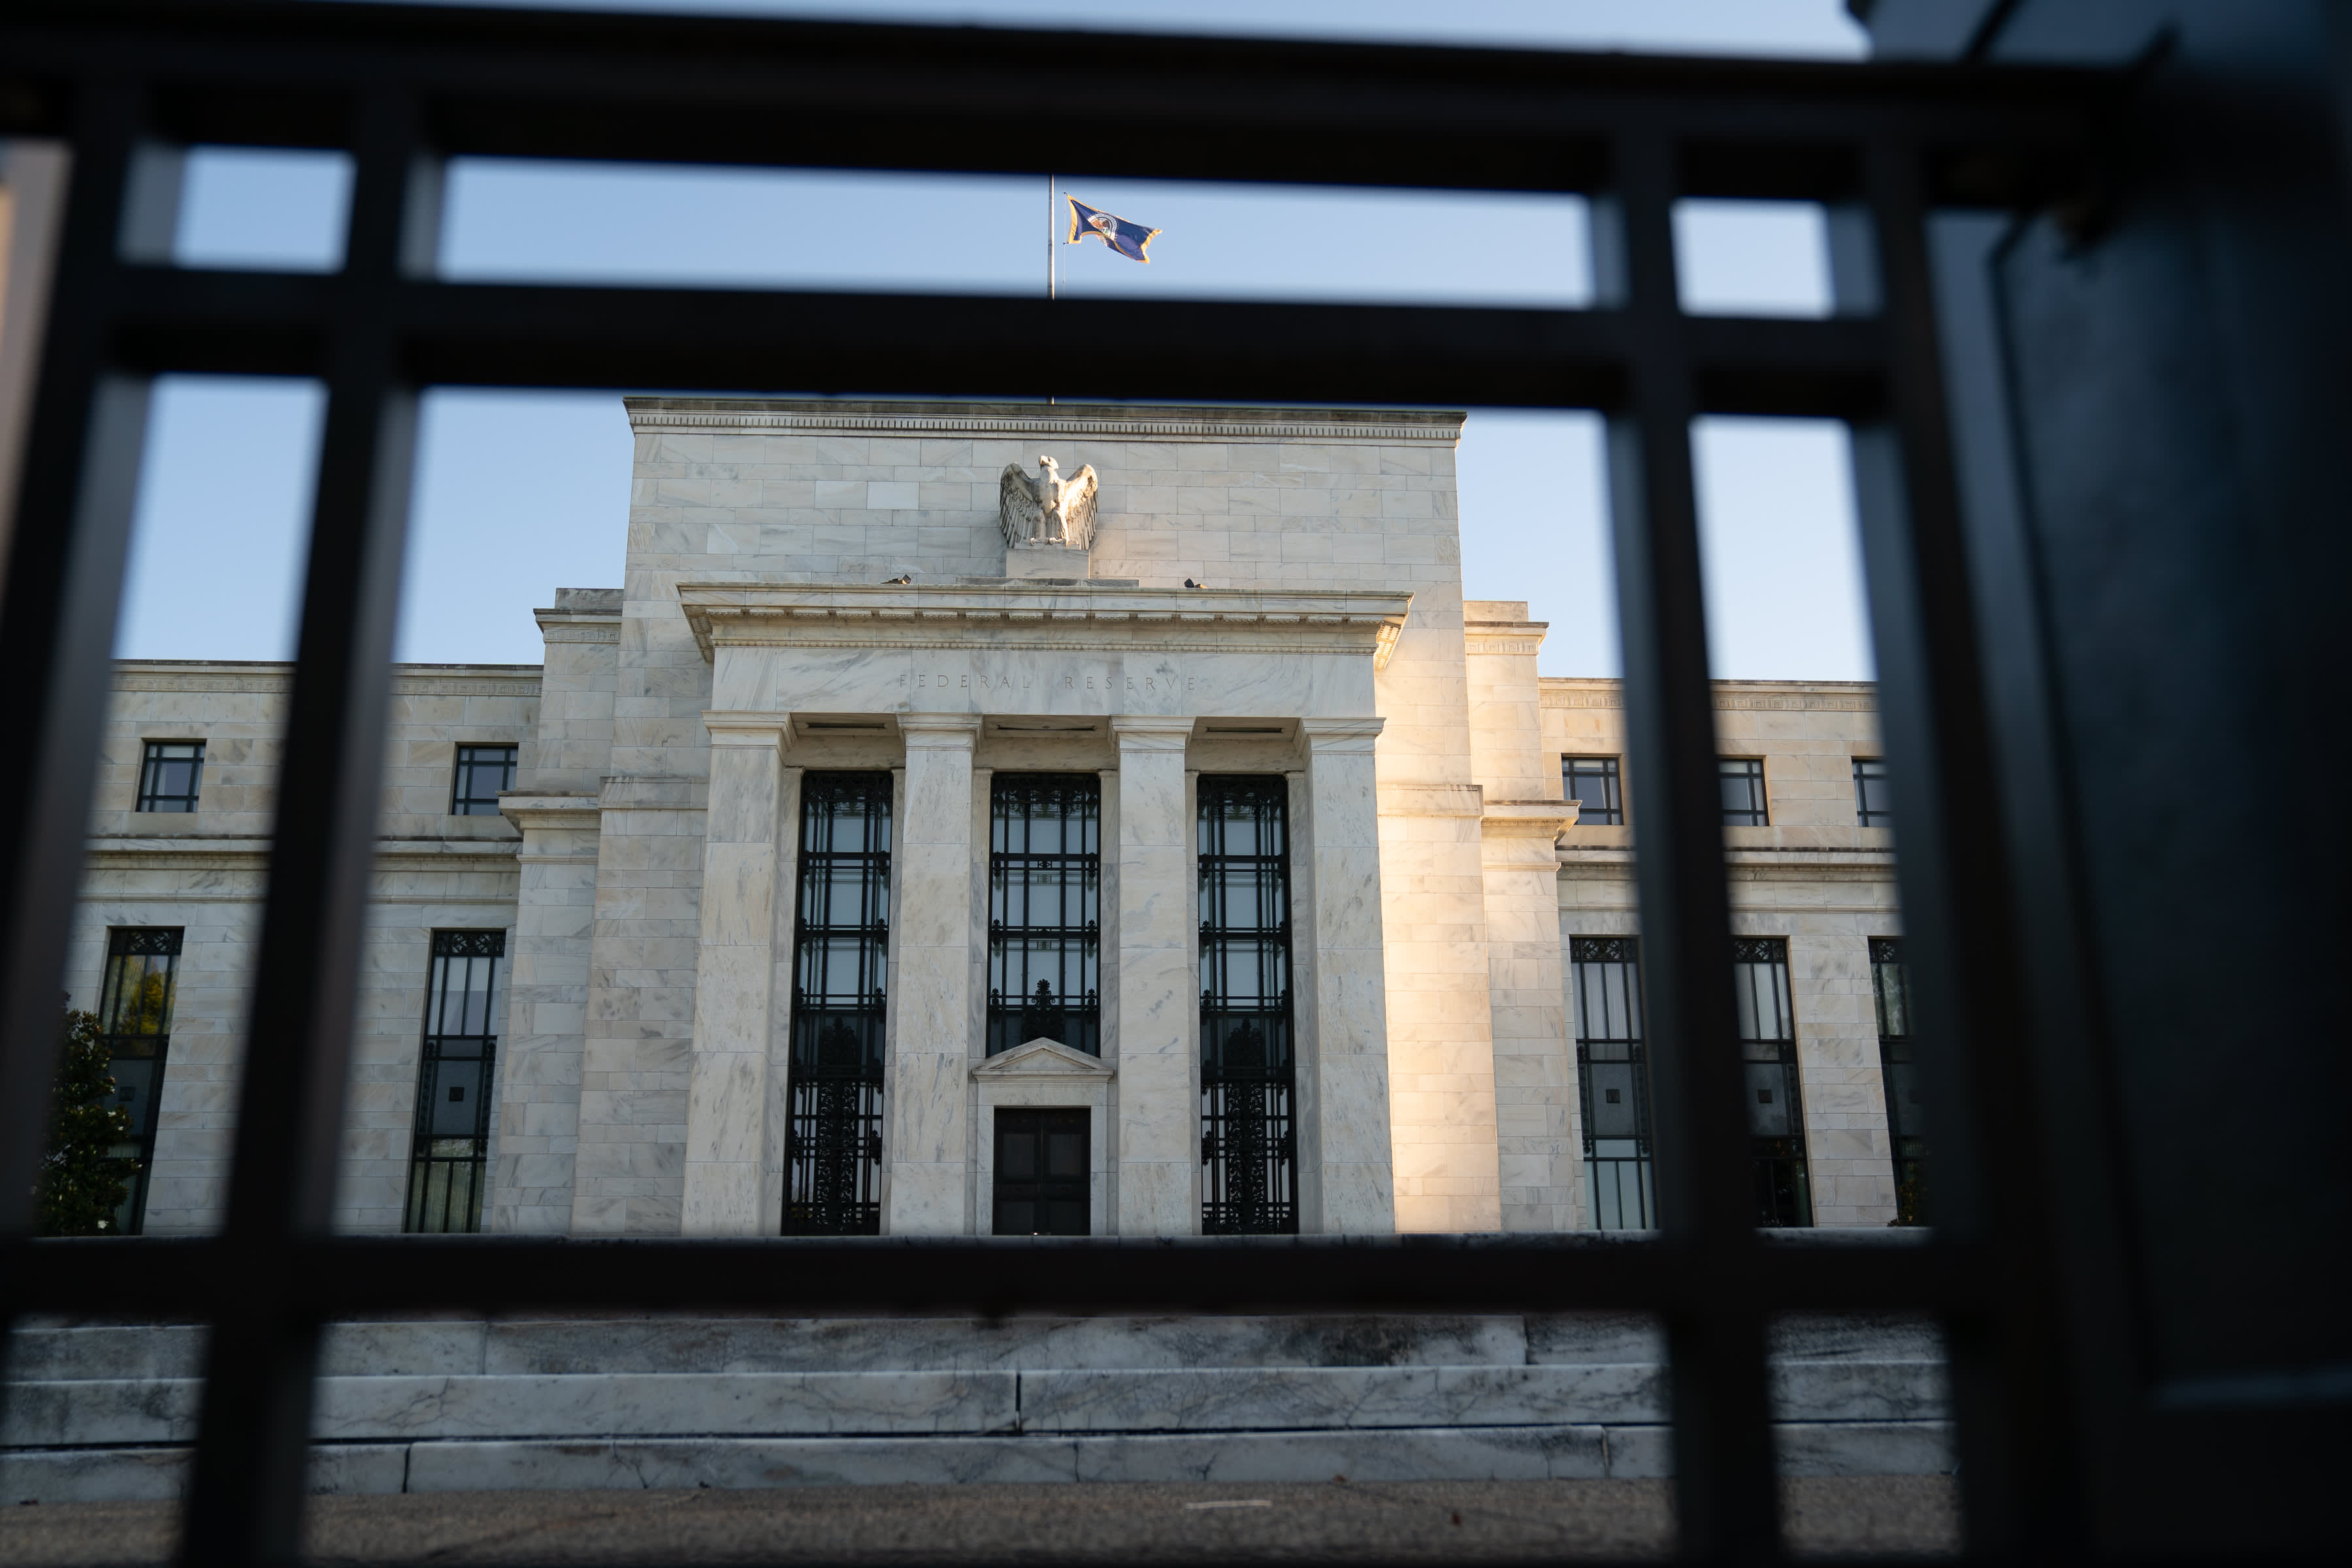 Fed allows banks to resume share buybacks, JPMorgan stock jumps 5%